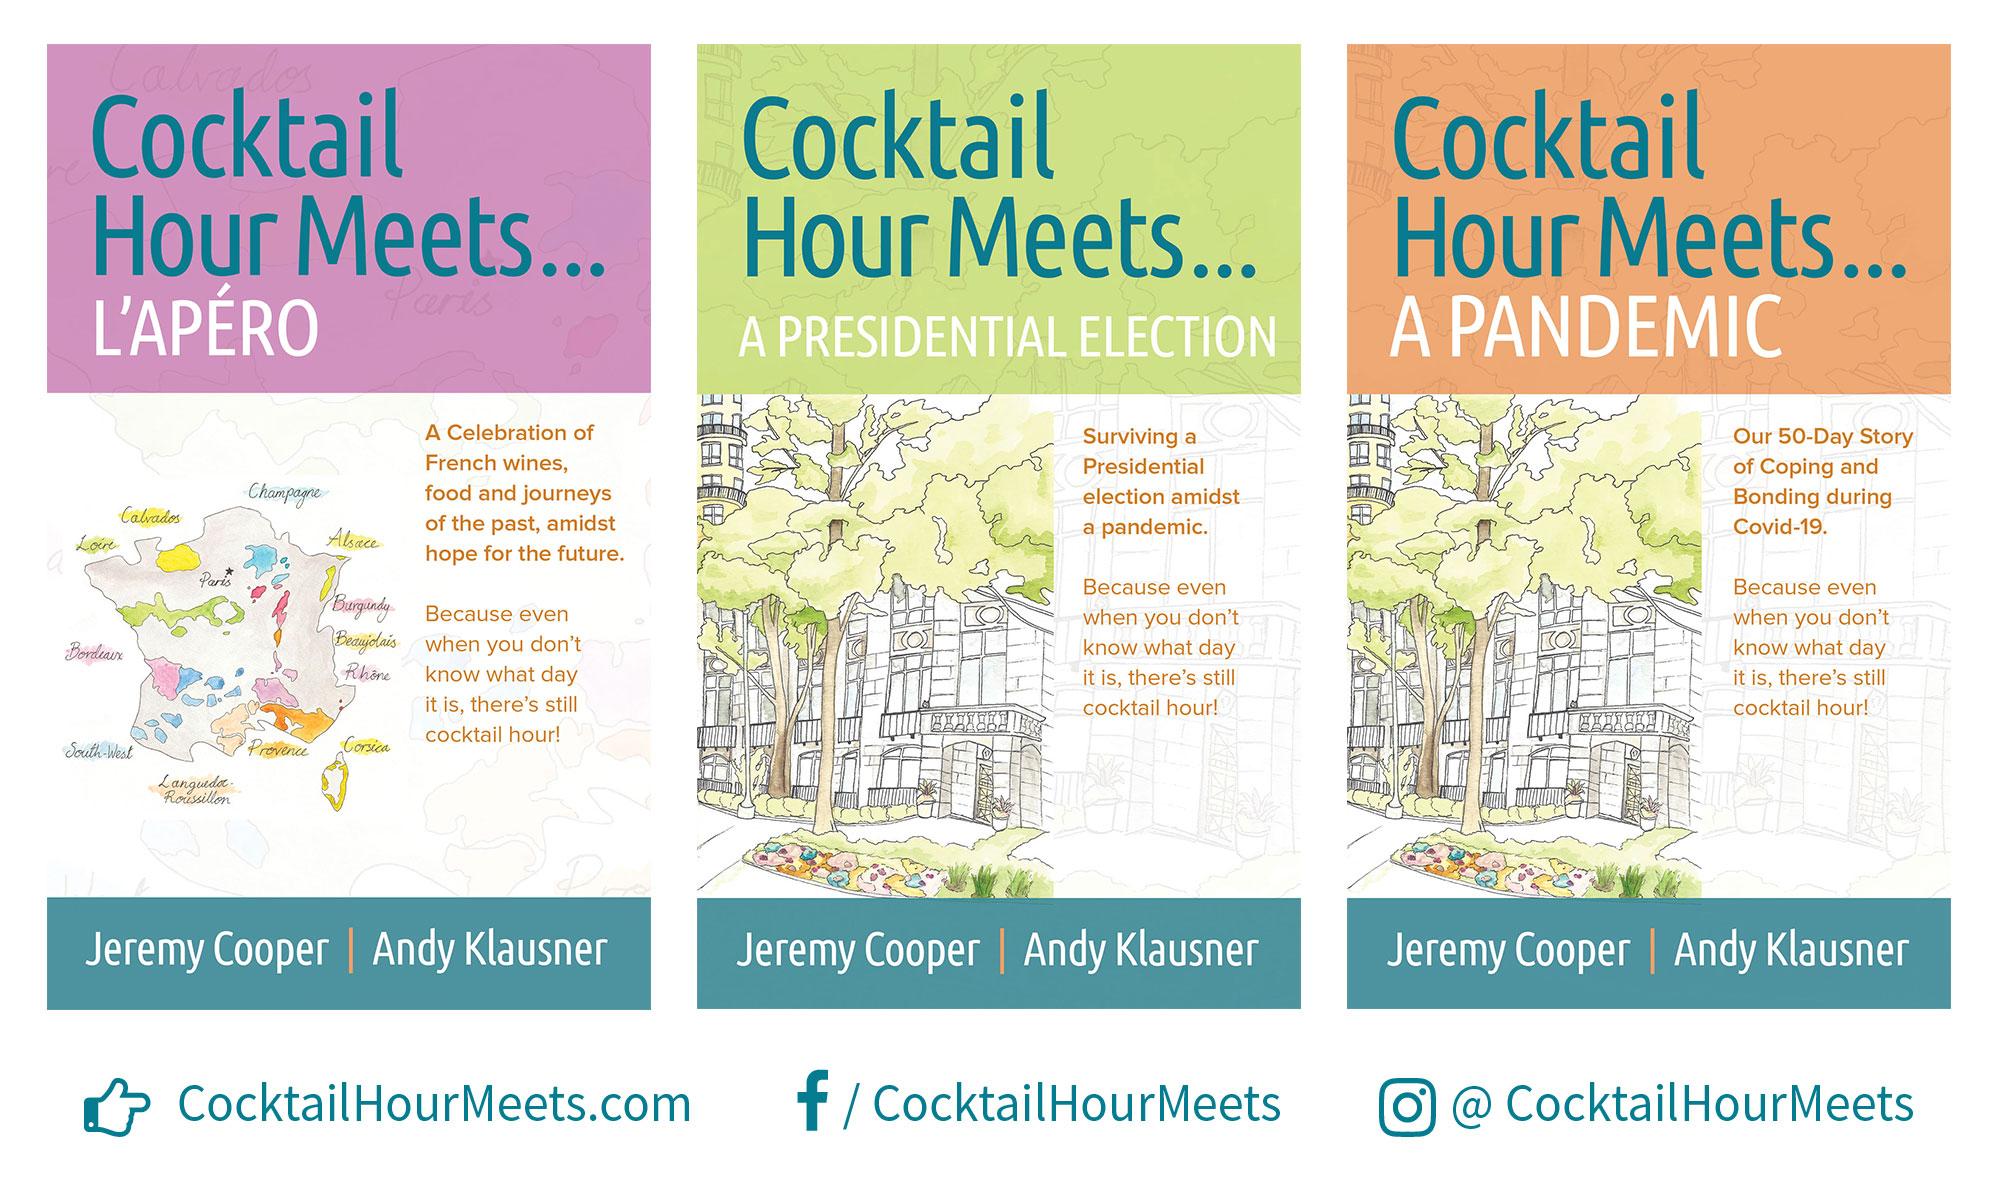 Cocktail Hour Meets...A PANDEMIC